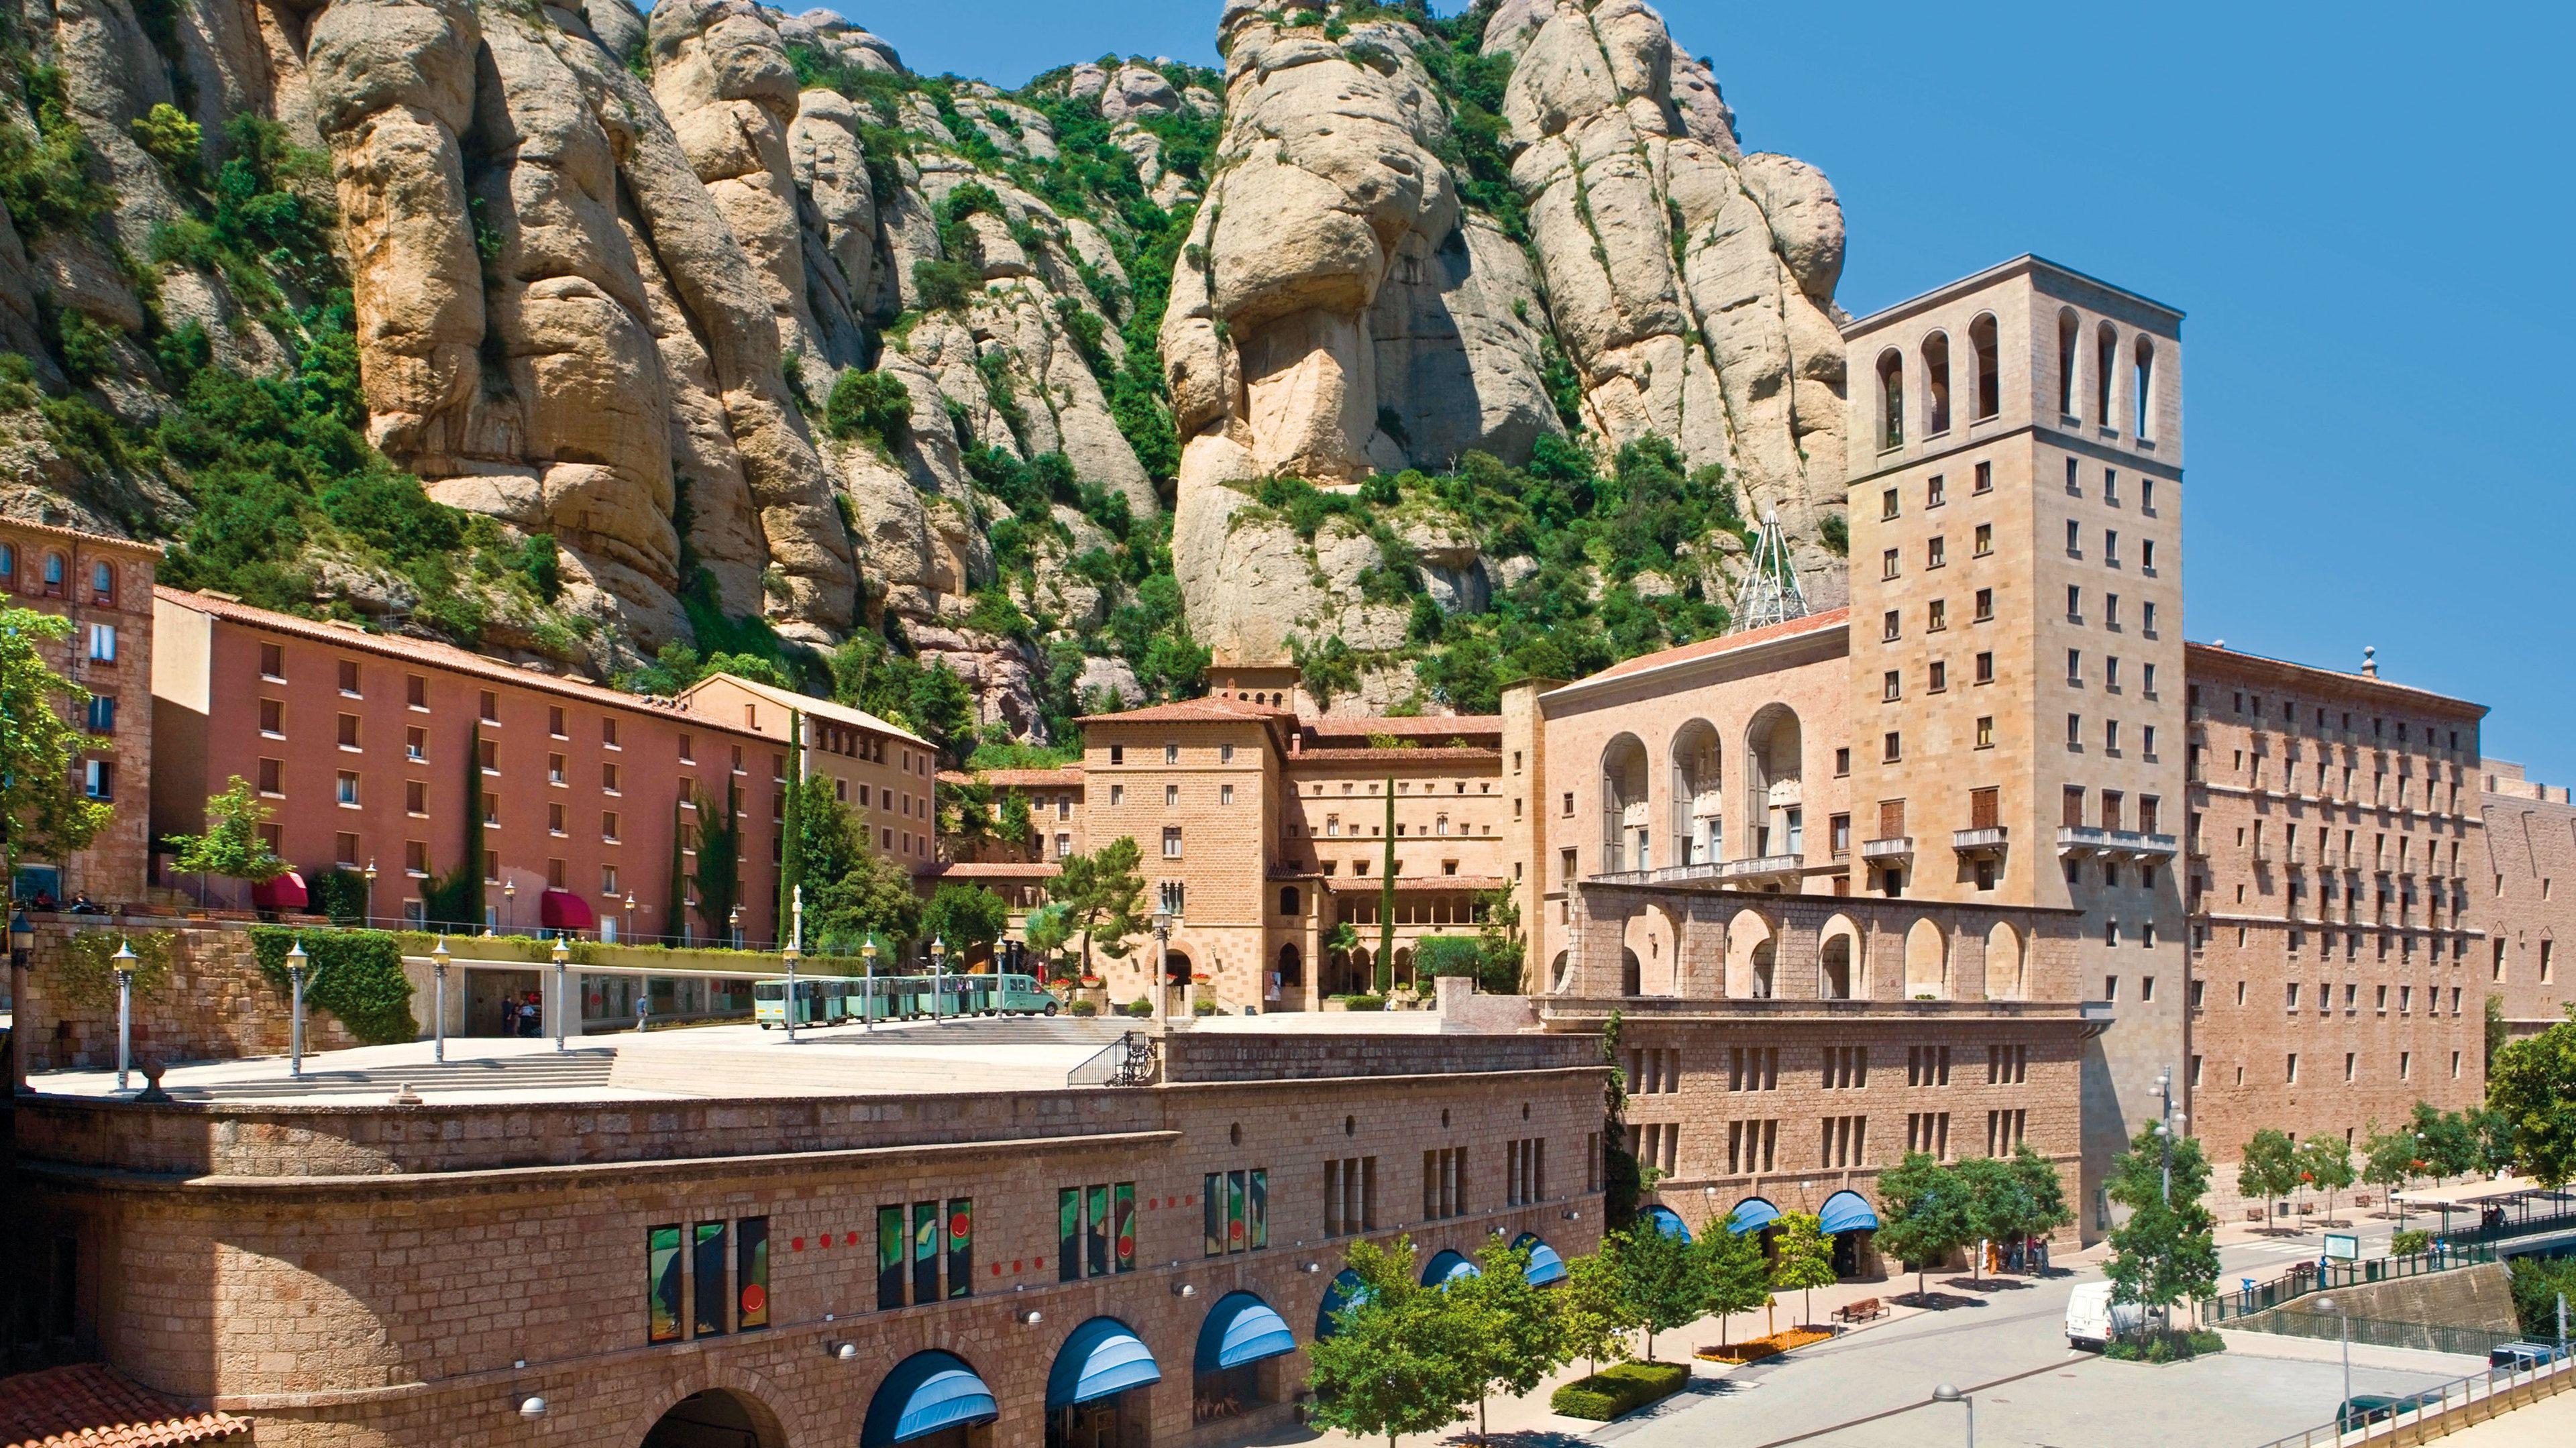 Montserrat & Codorníu Winery Small-Group Tour